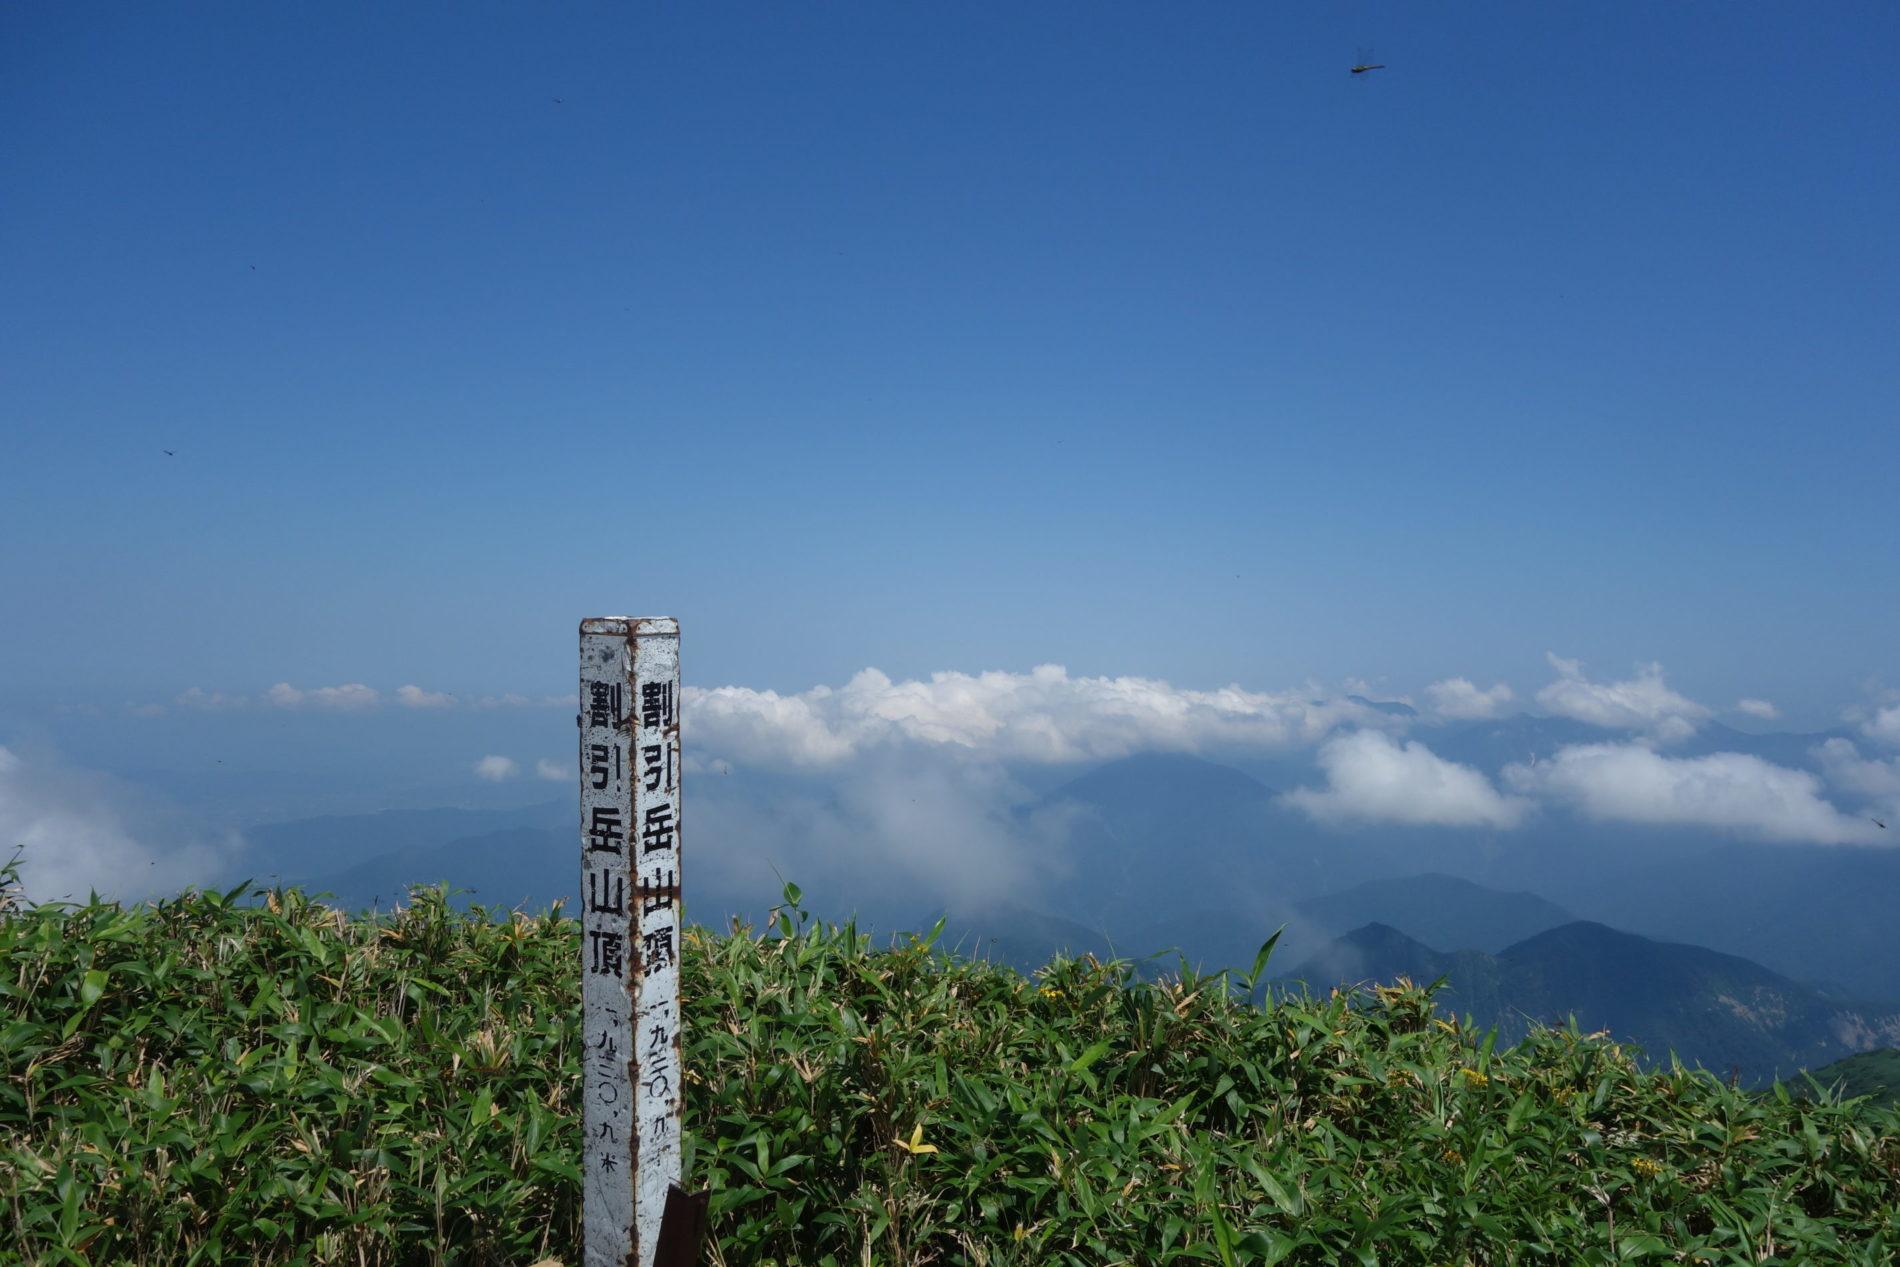 巻機山 ニセ巻機山〜巻機山〜牛ヶ岳〜割引岳